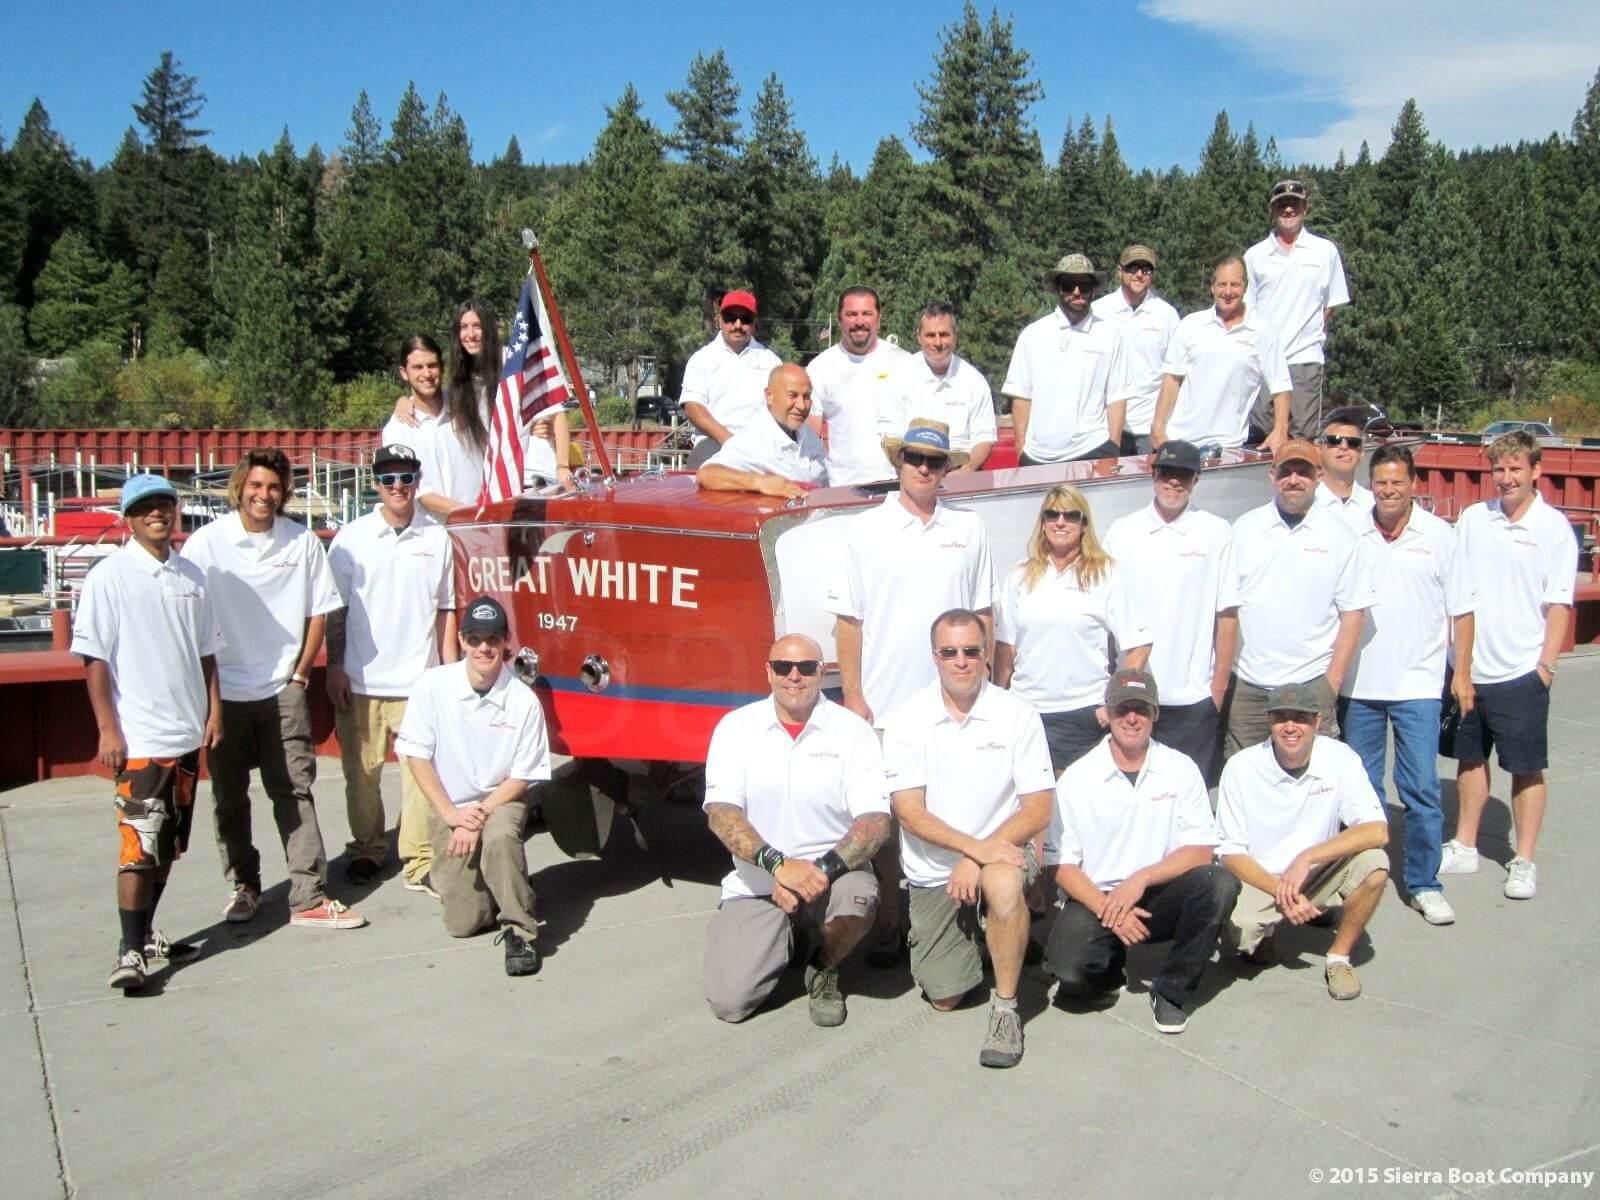 The Sierra Boat Company Crew